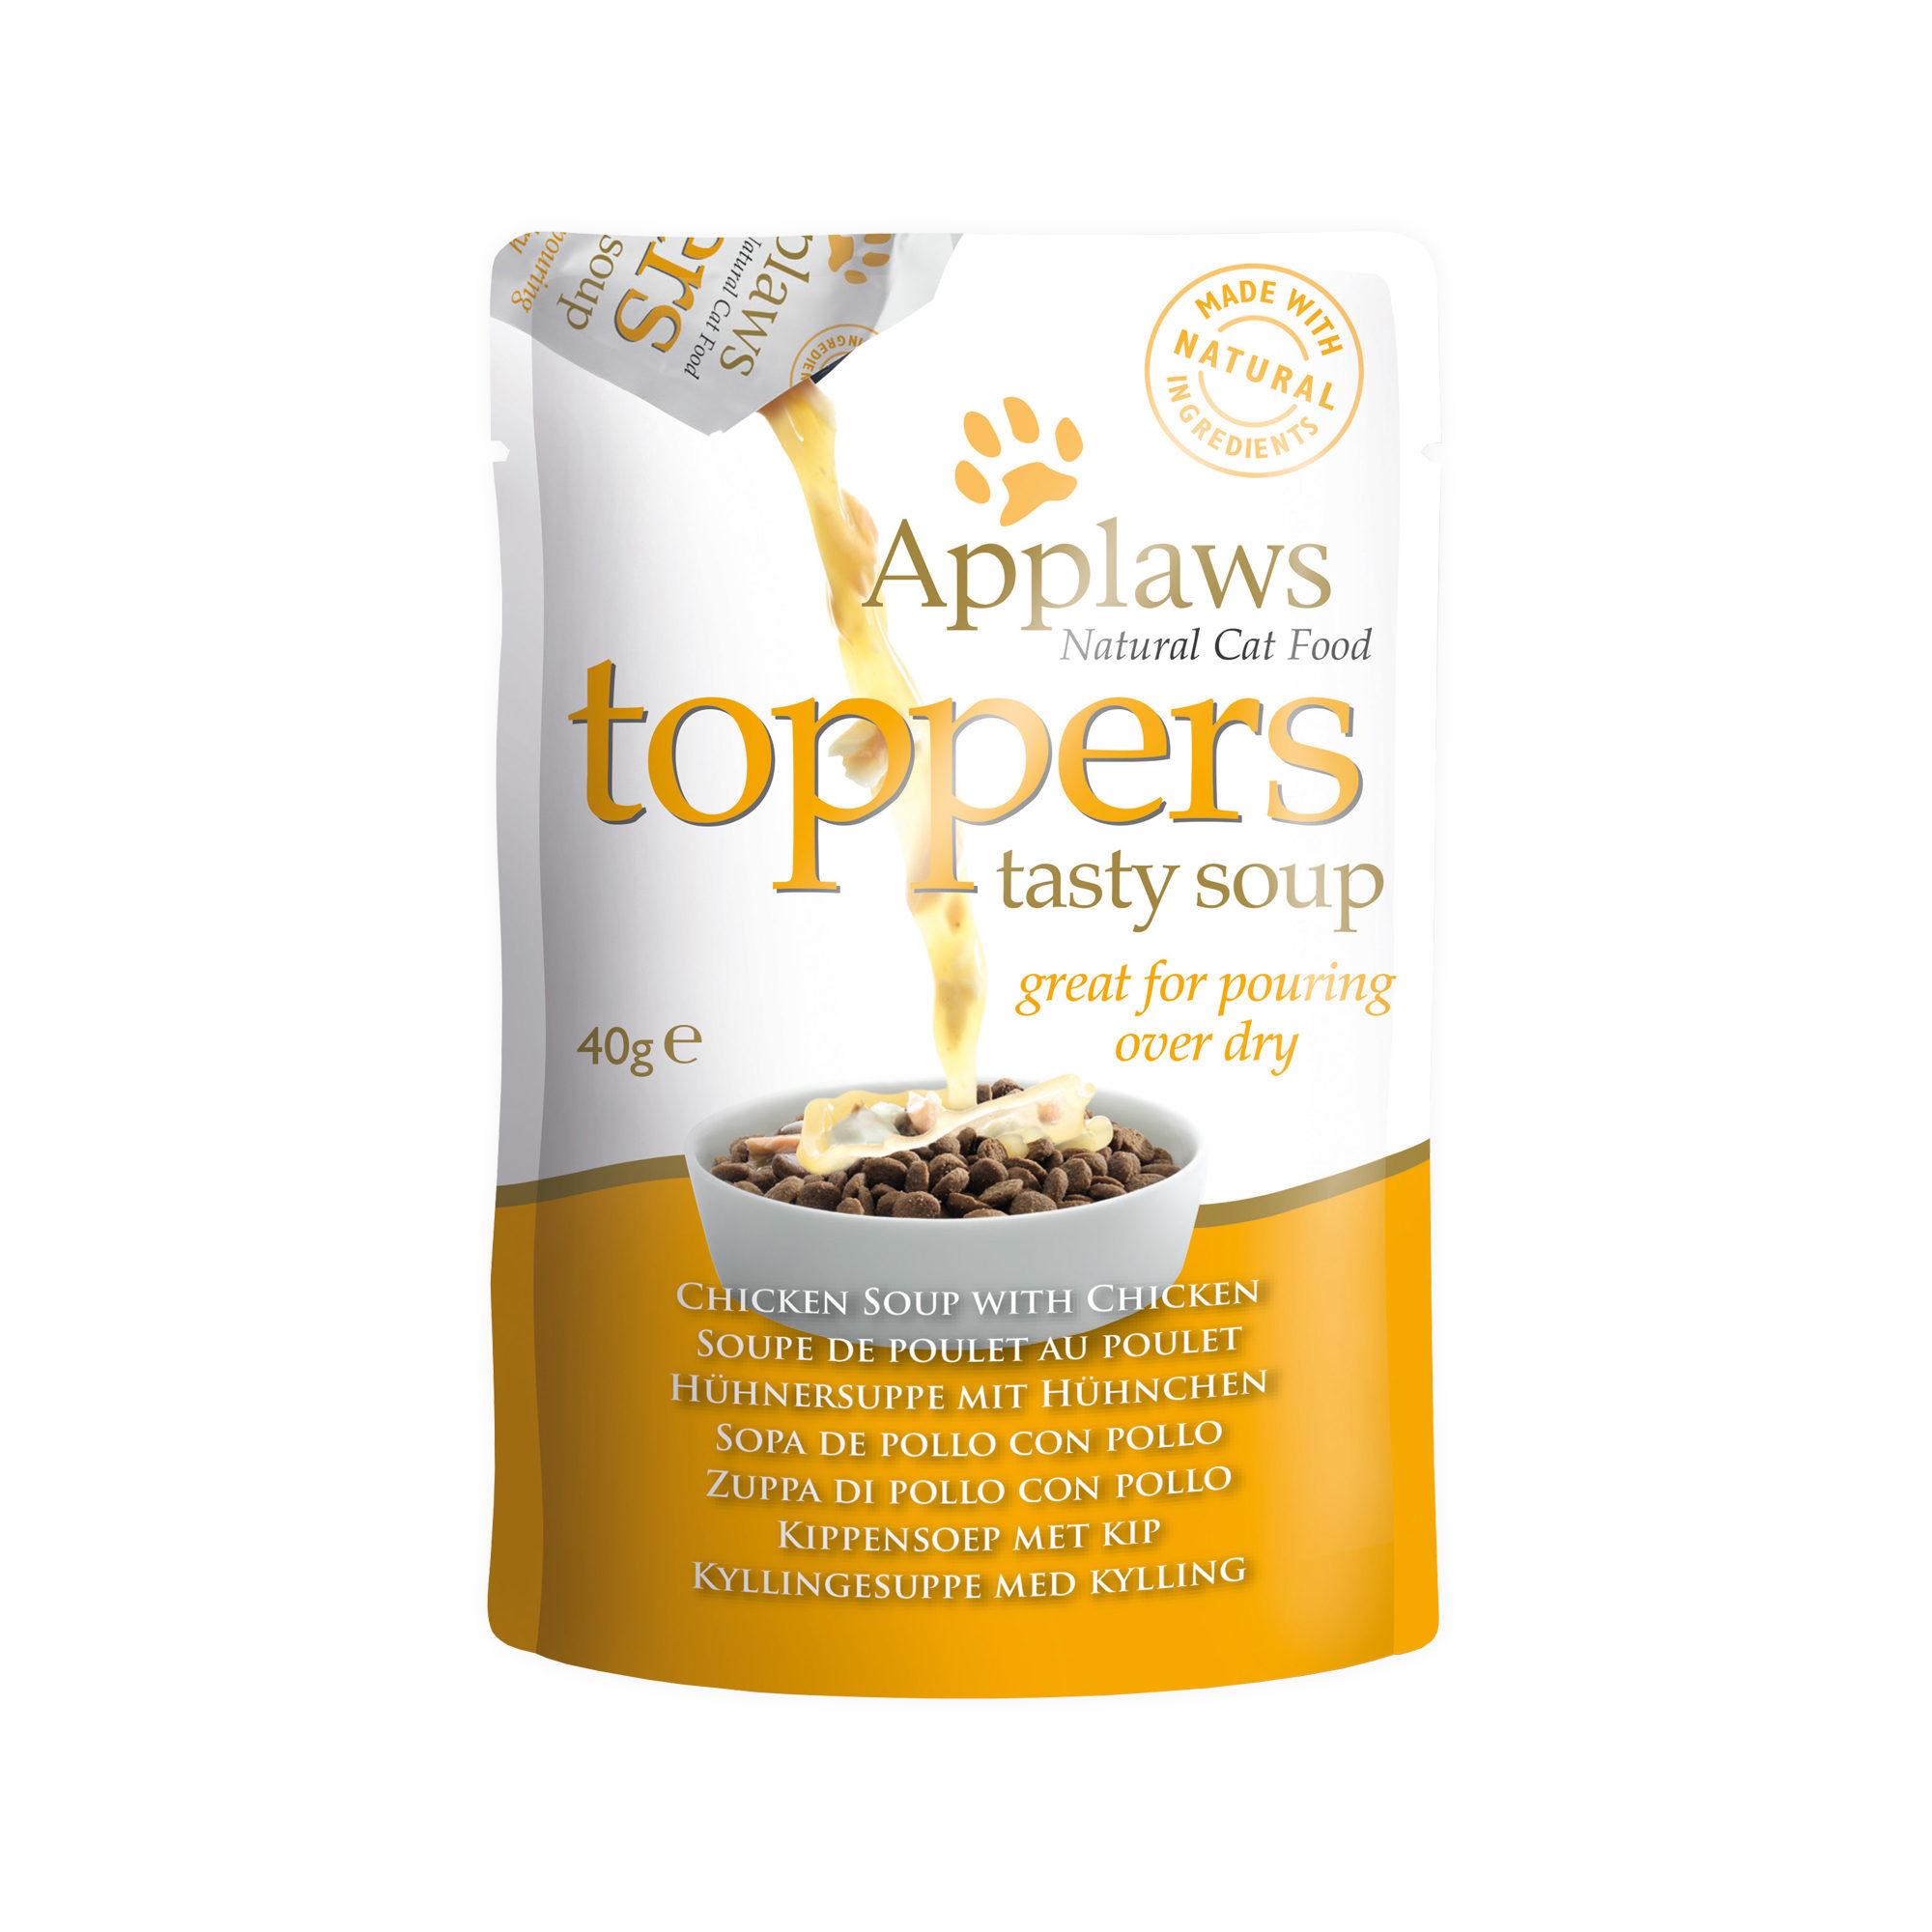 Applaws Toppers Tasty Soup Katzenfutter - Frischebeutel - Chicken